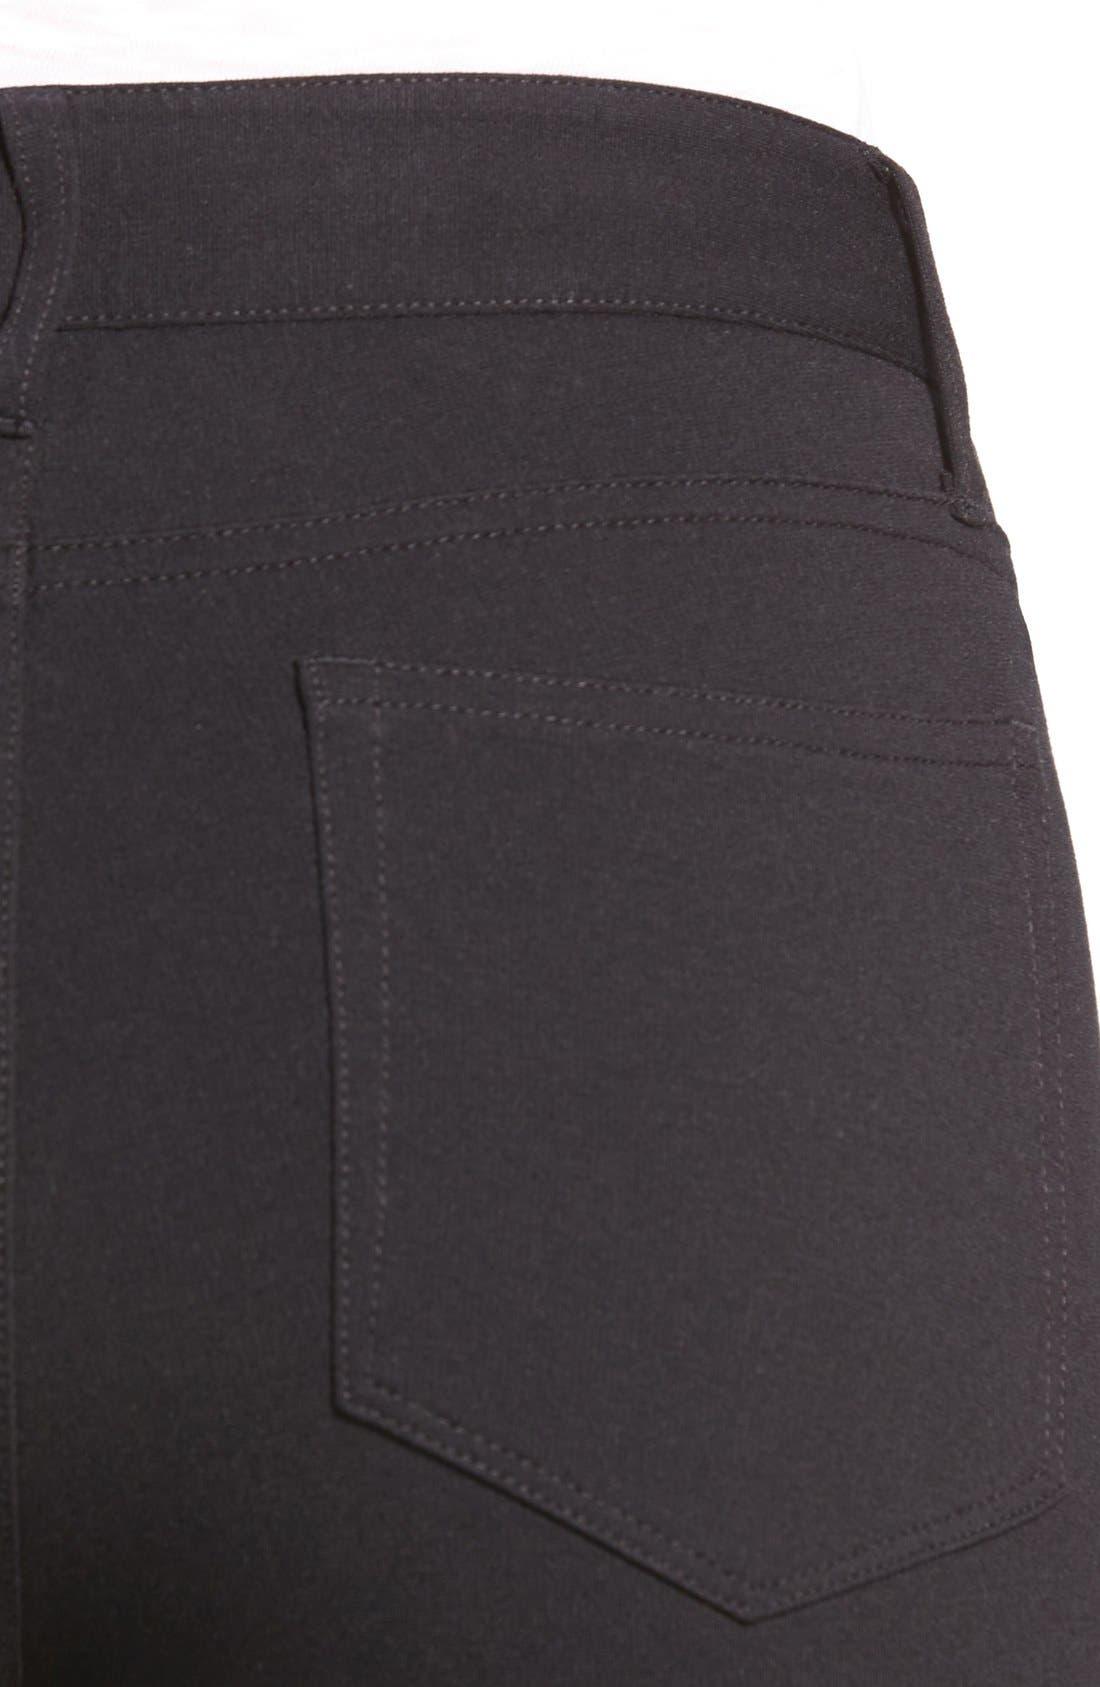 Alternate Image 4  - PAIGE Hoxton Ankle Ponte Pants